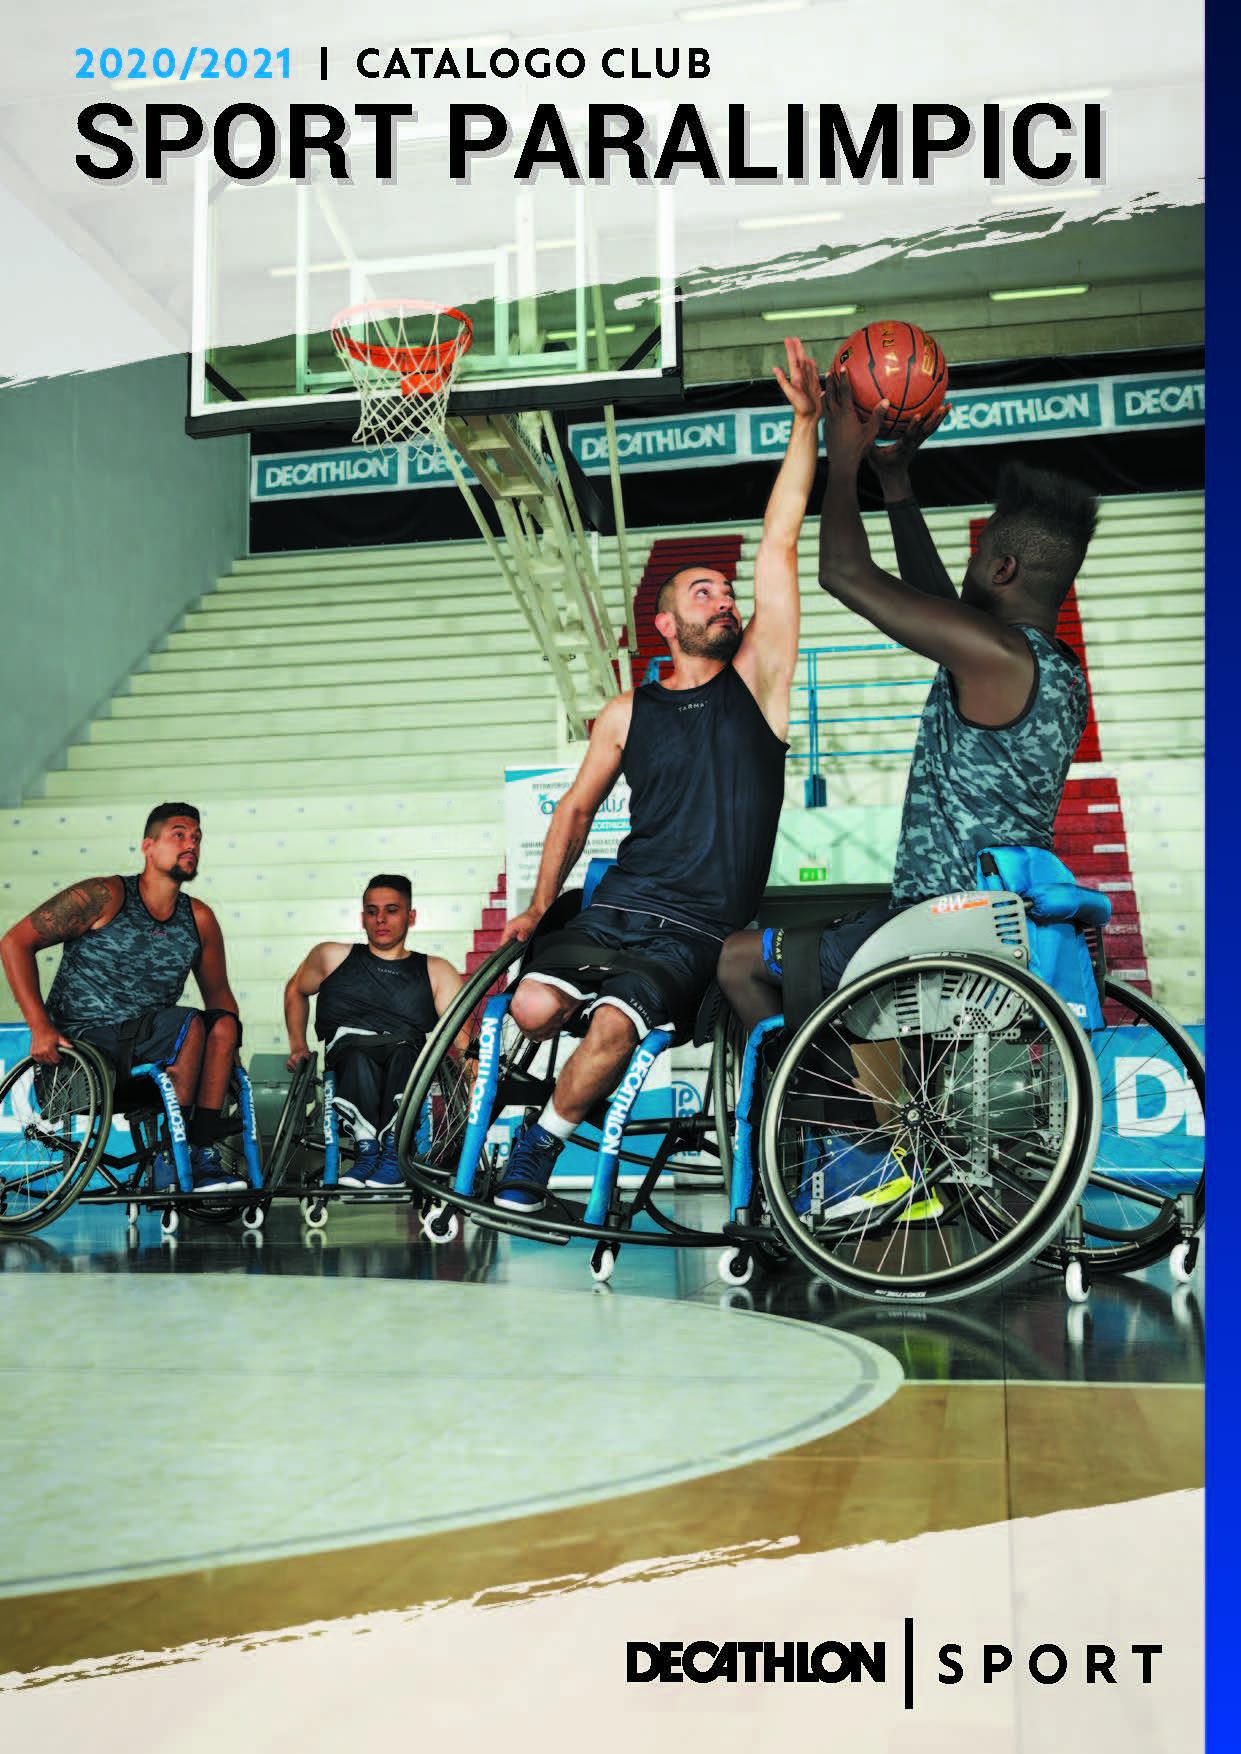 catalogo-sport-paralimpici 1